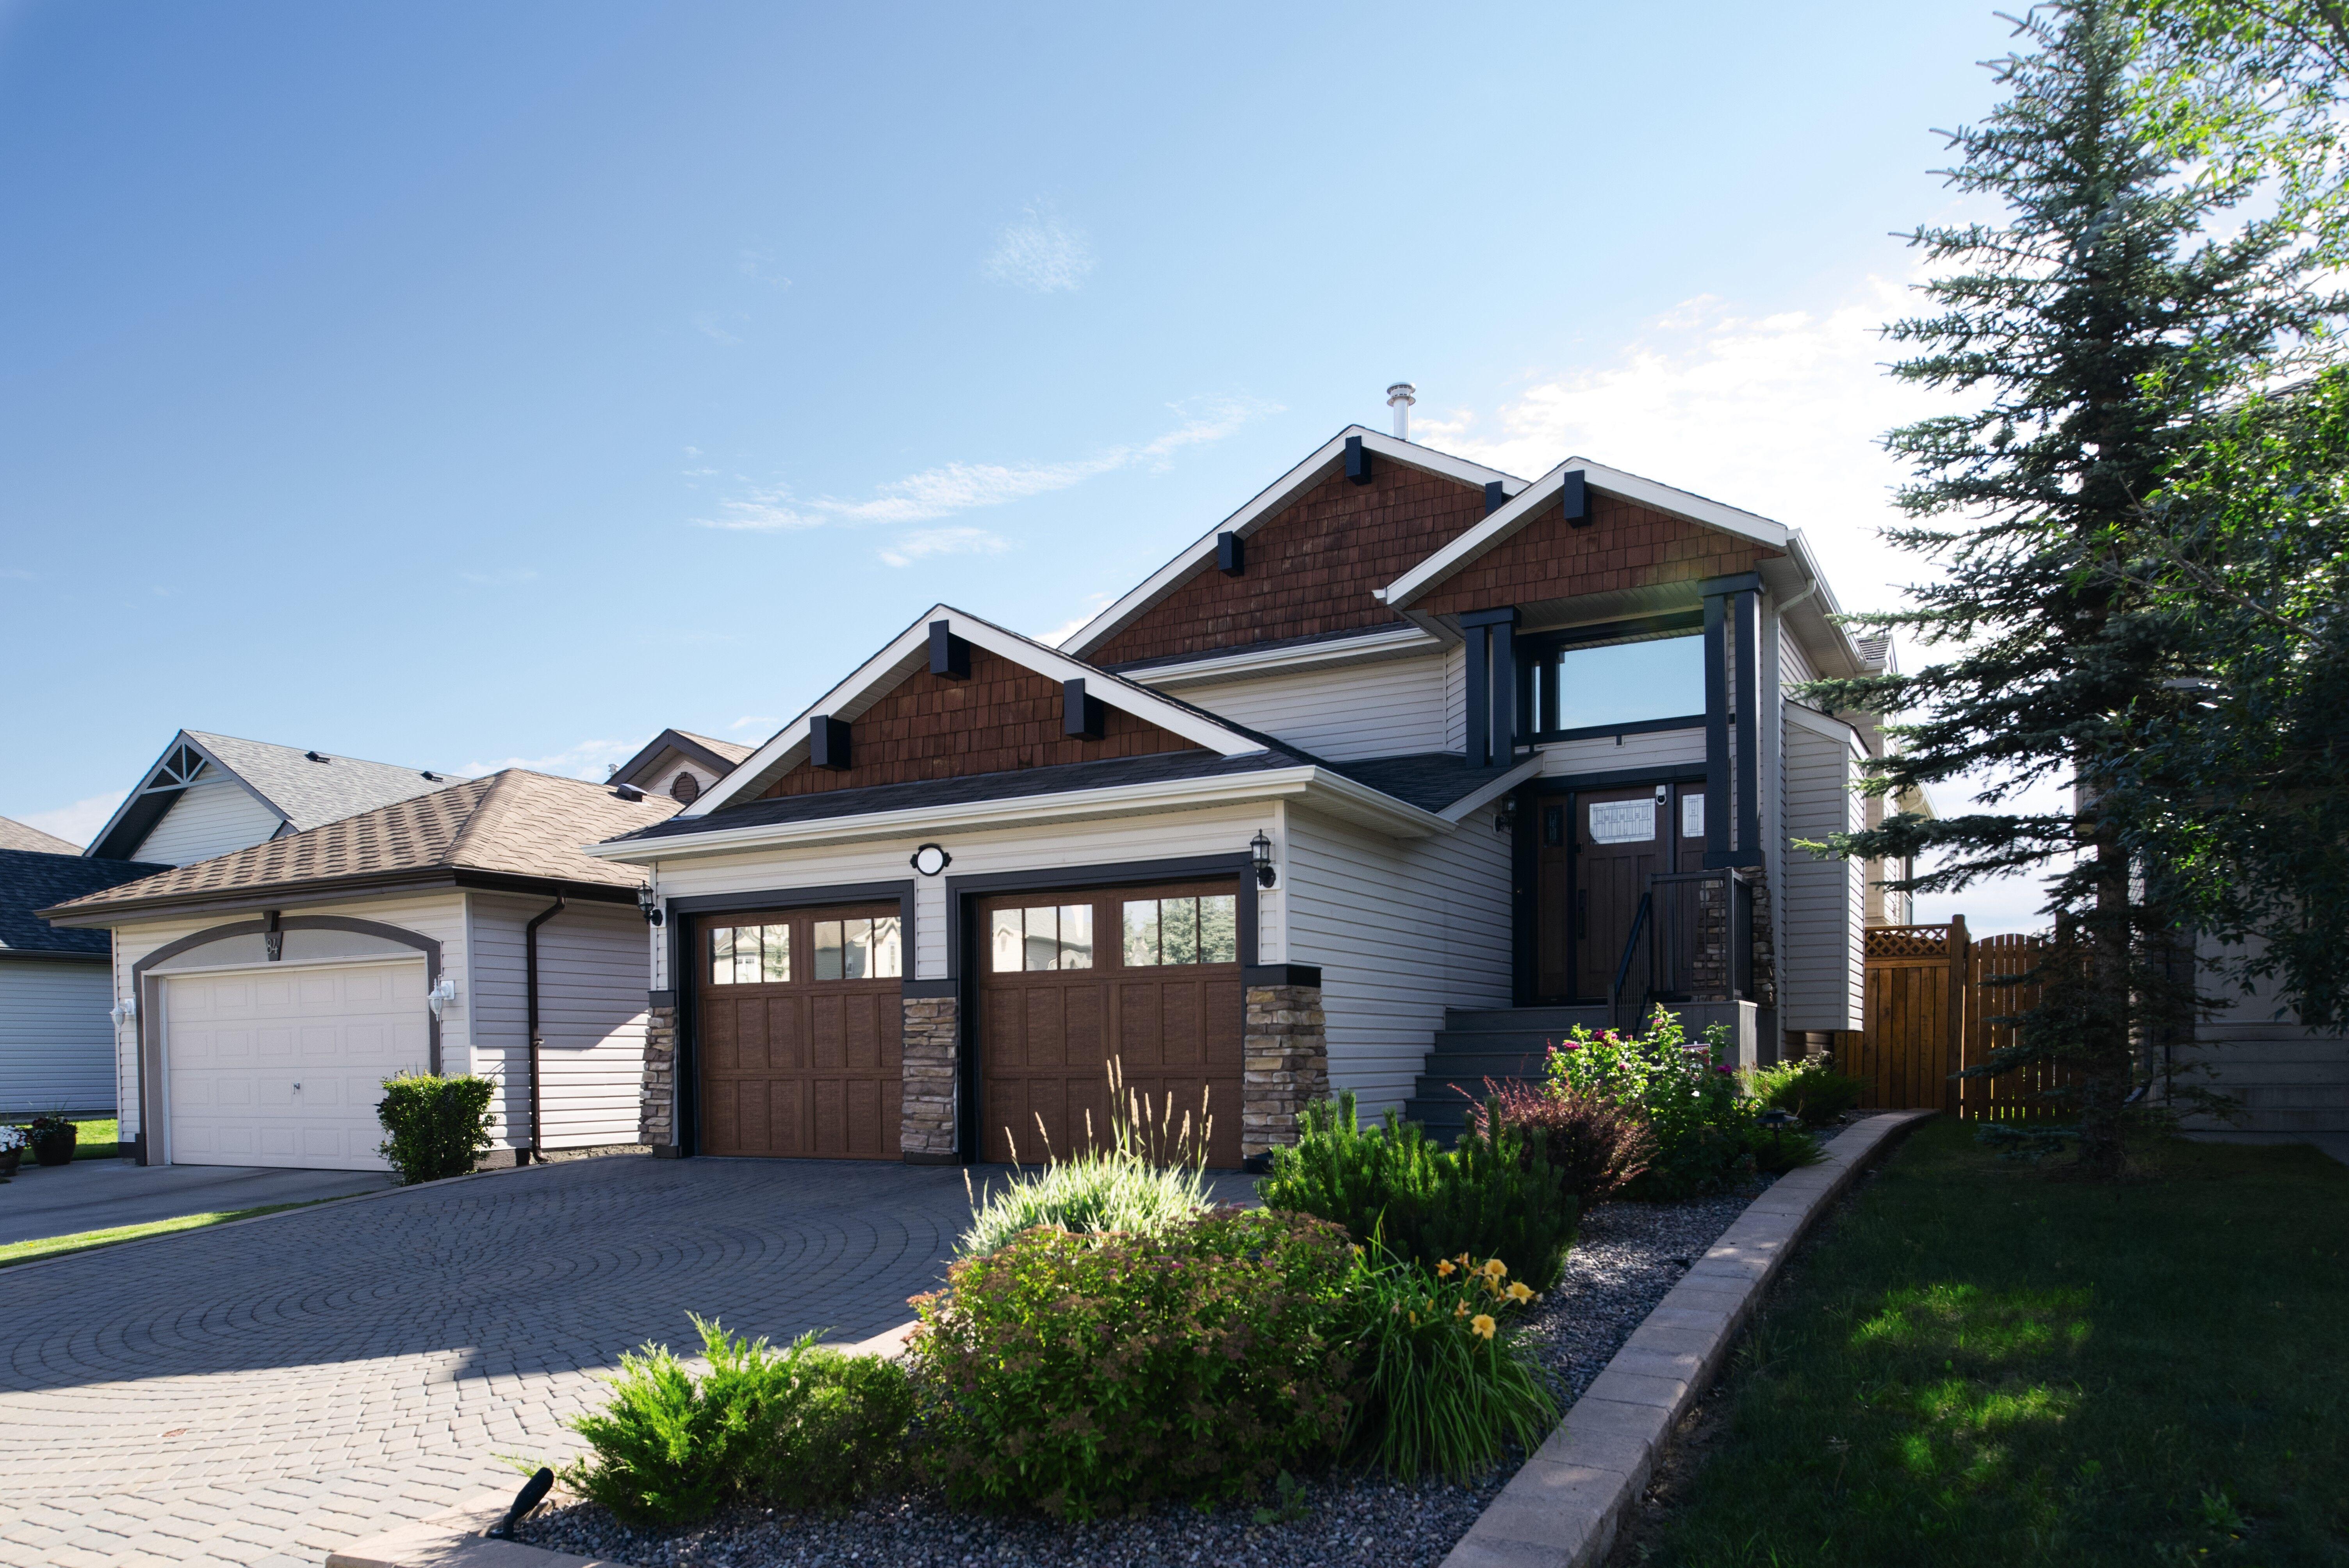 Energy Efficient Garage Doors: Worth the Investment ...